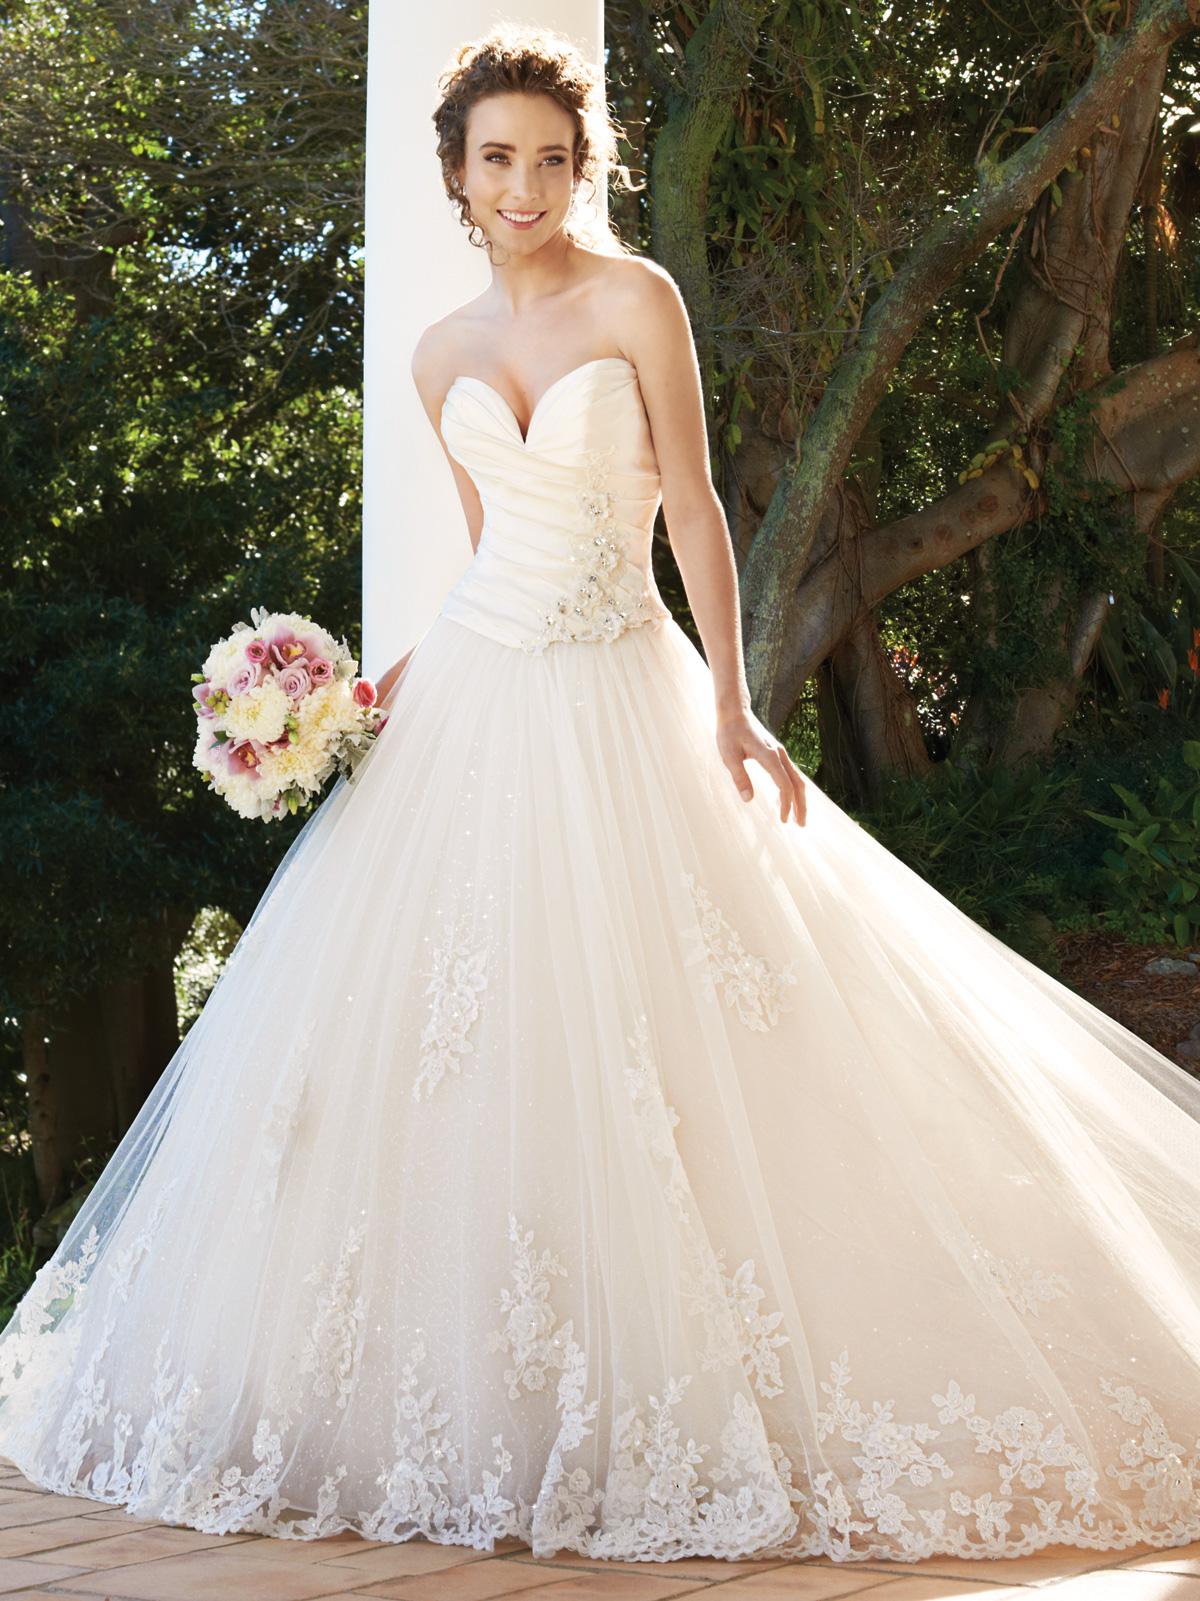 AA plunging neckline wedding dress plunging sweetheart ball gown wedding dress